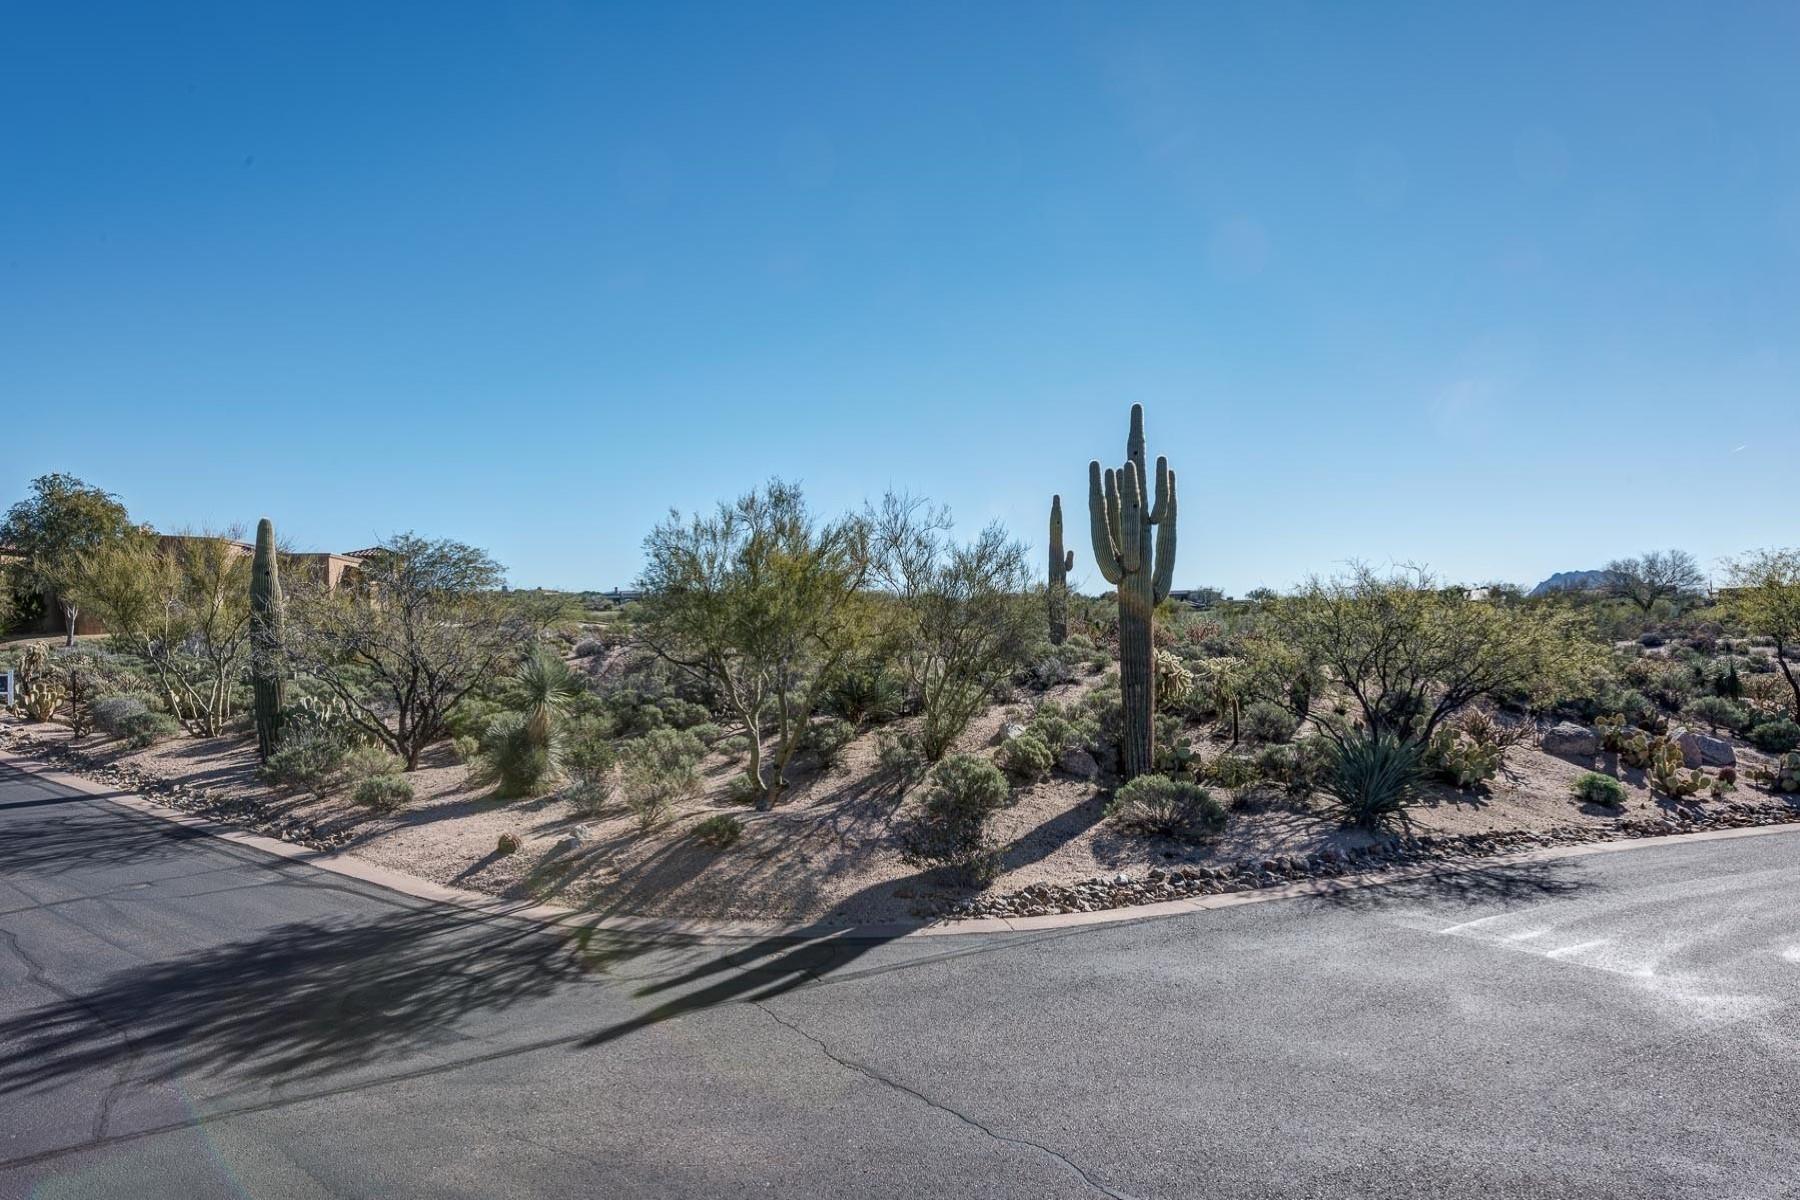 Terreno para Venda às Beautiful 2nd fairway lot with views of the 3rd fairway 37981 N 104th Pl #57, Scottsdale, Arizona, 85262 Estados Unidos